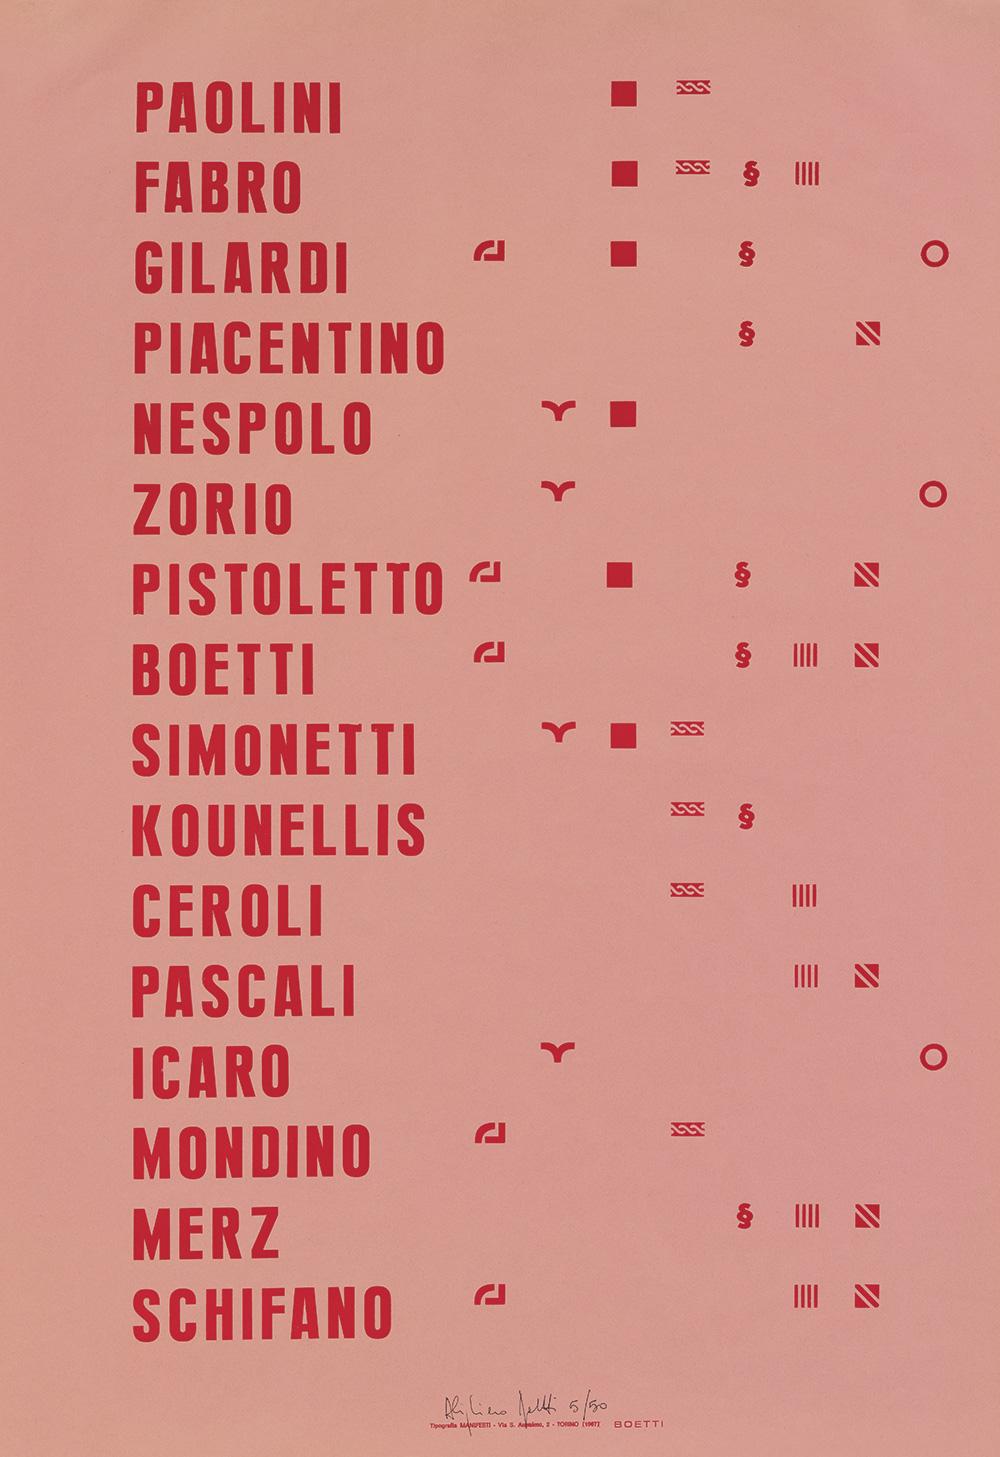 Manifesto-1967,-stampa-offset;-edizione-in-800-esemplari-di-cui-50-firmati-e-numerati-da-1-a-50,-cm-100-X-70